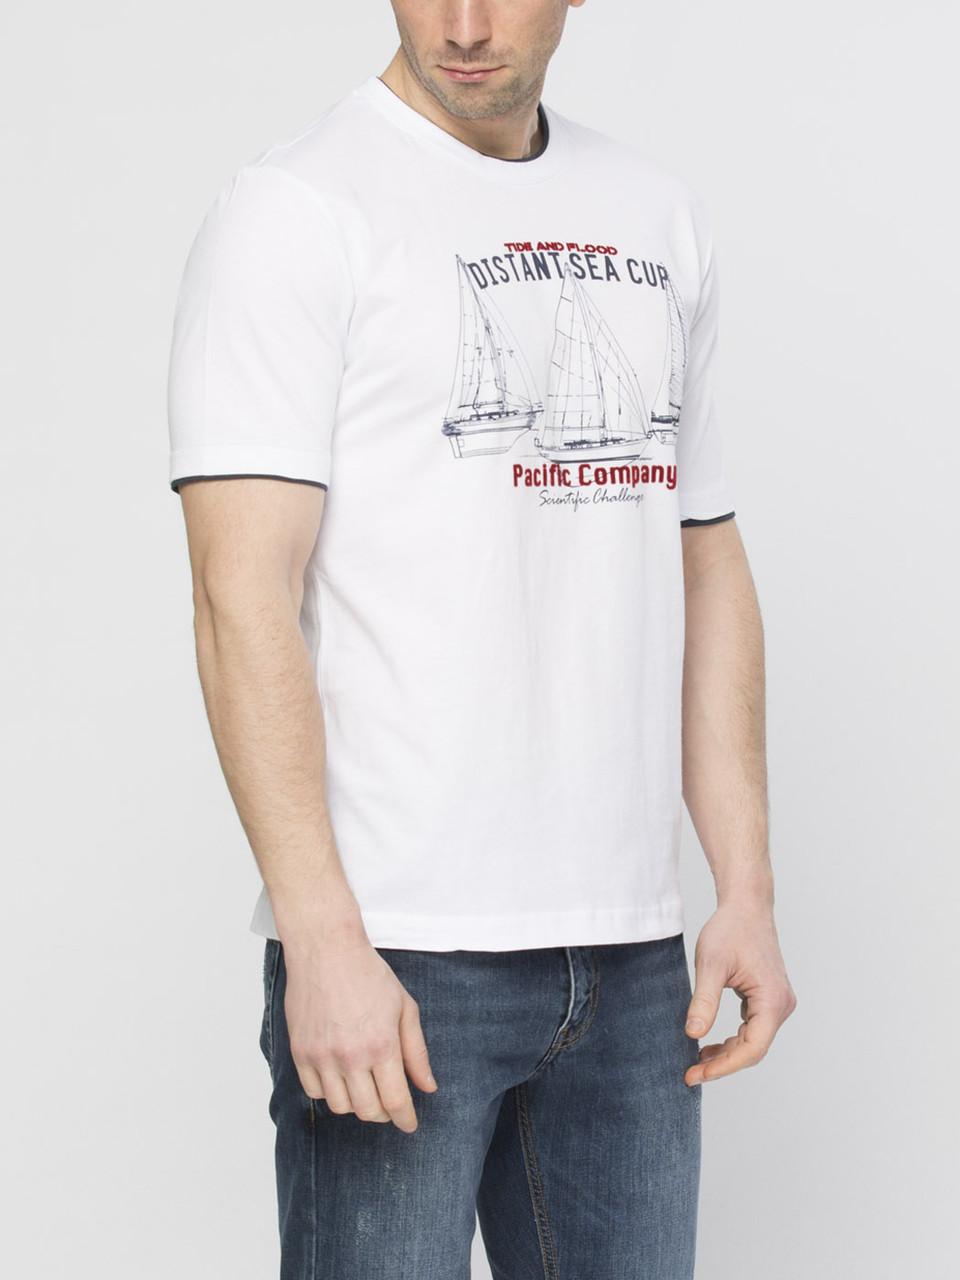 Мужская футболка белая LC Waikiki / ЛС Вайкики с надписью Distant sea cup